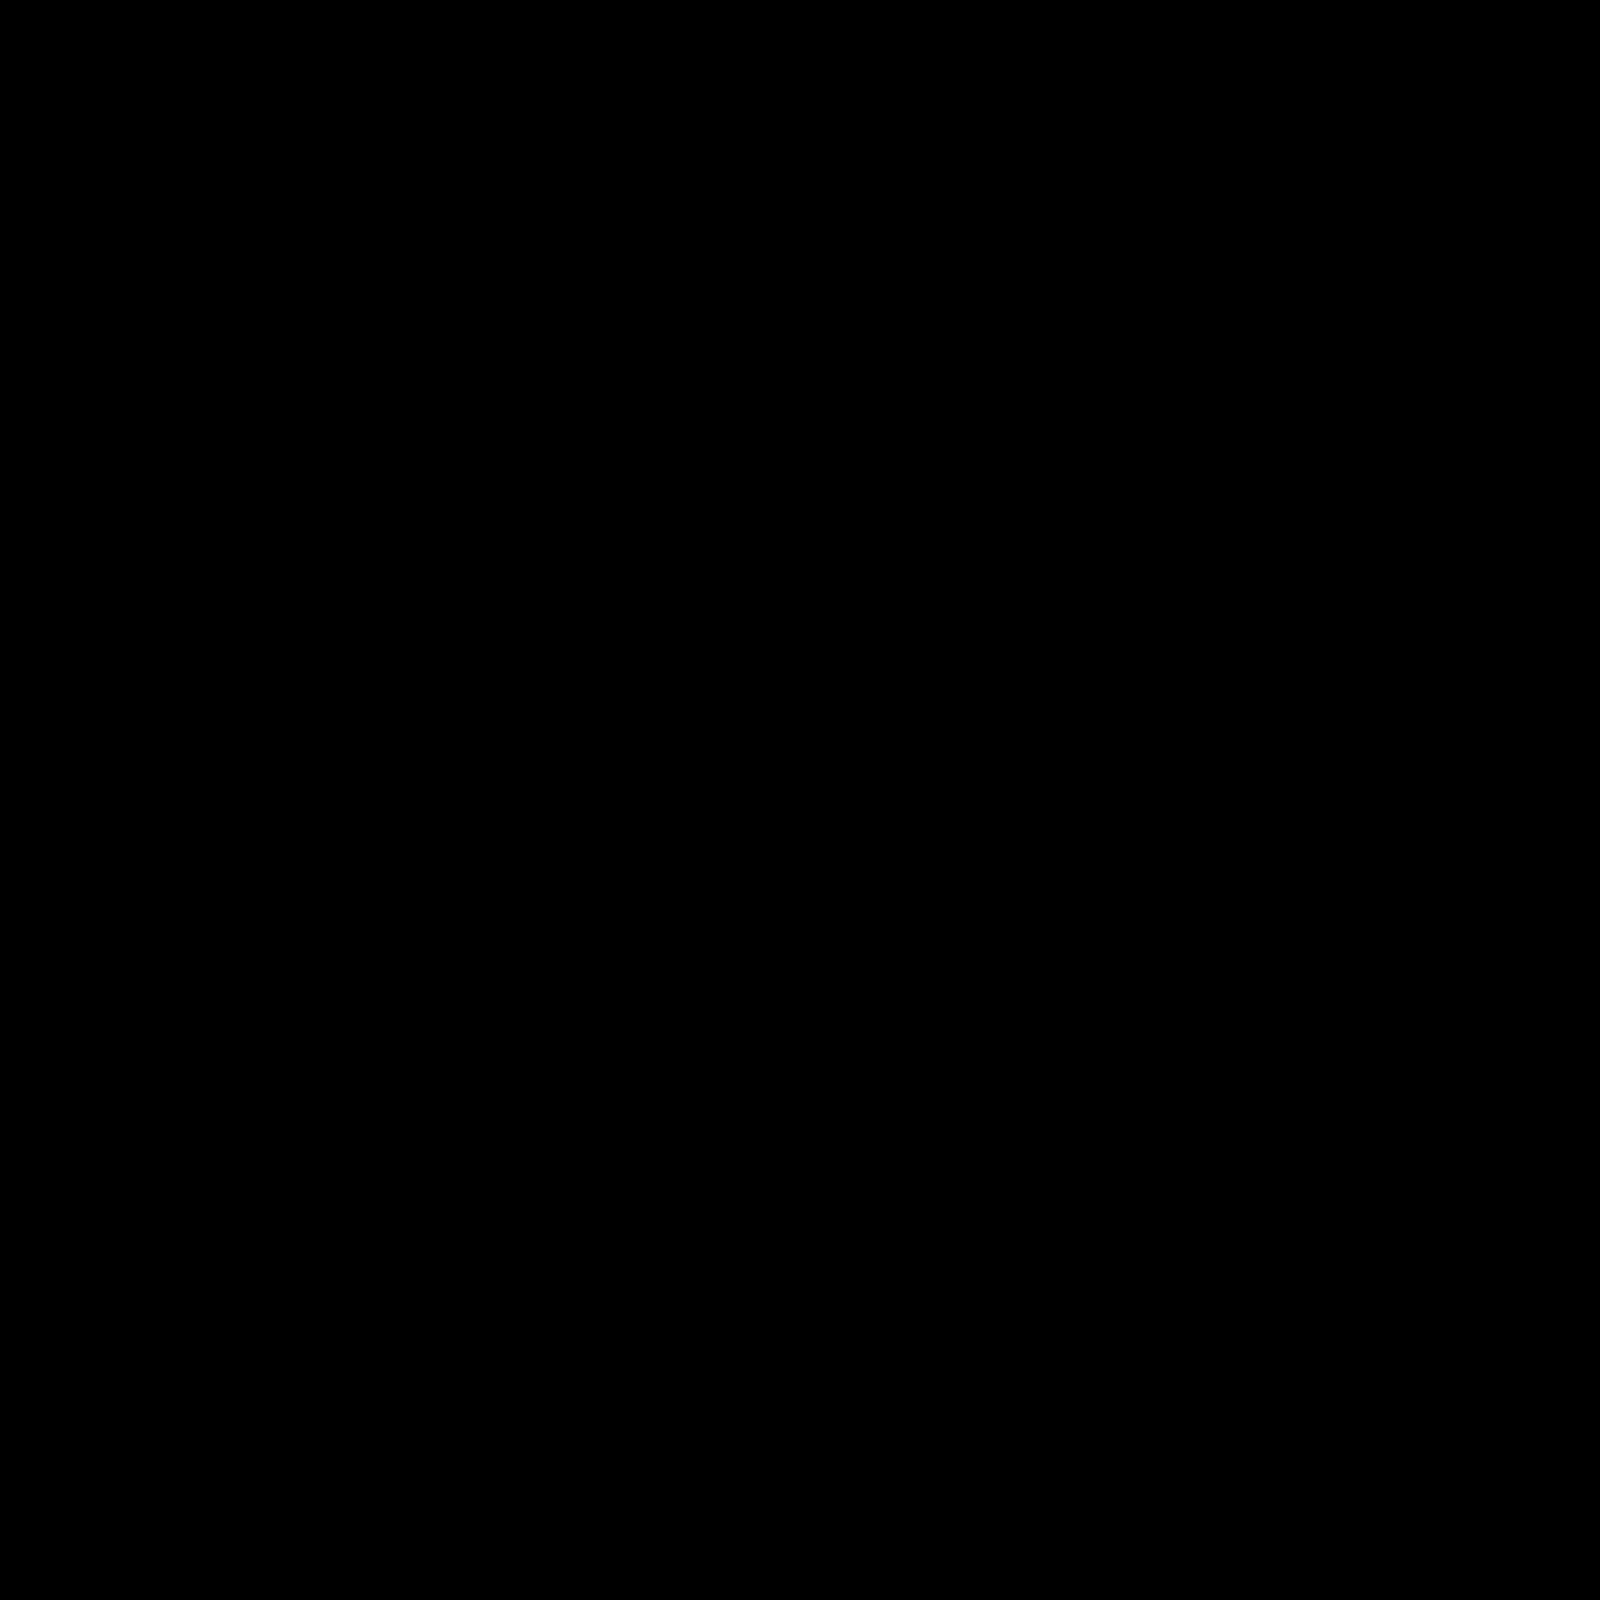 Janela de pop-up icon